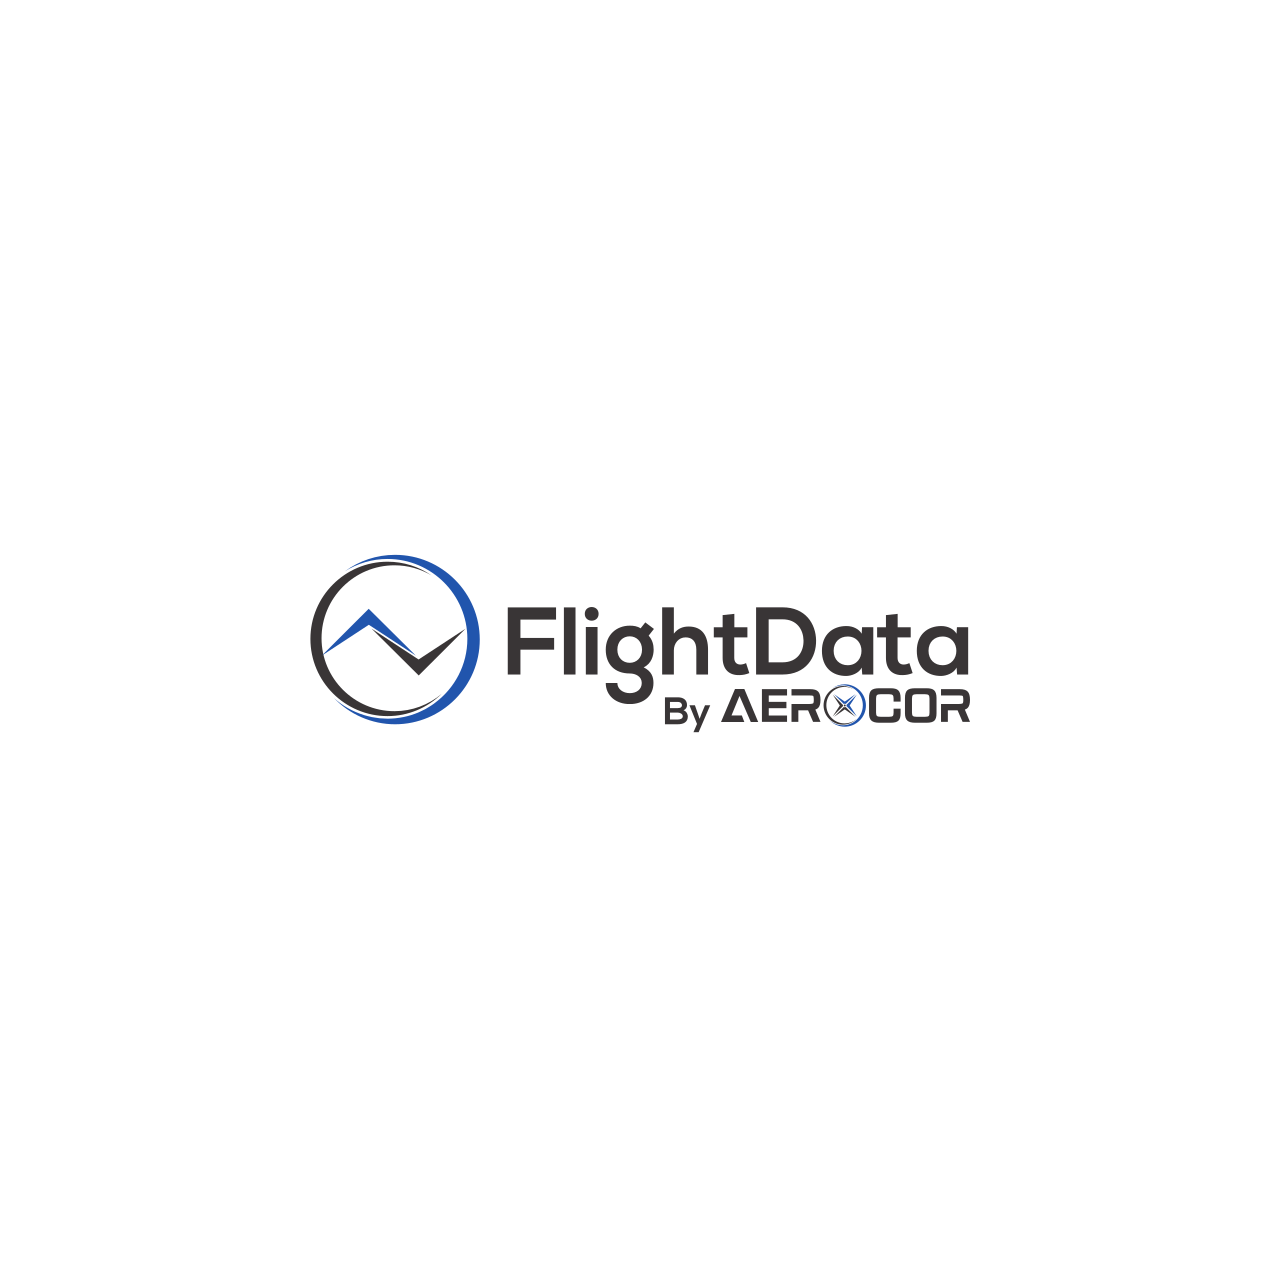 Logo for aircraft data analysis website